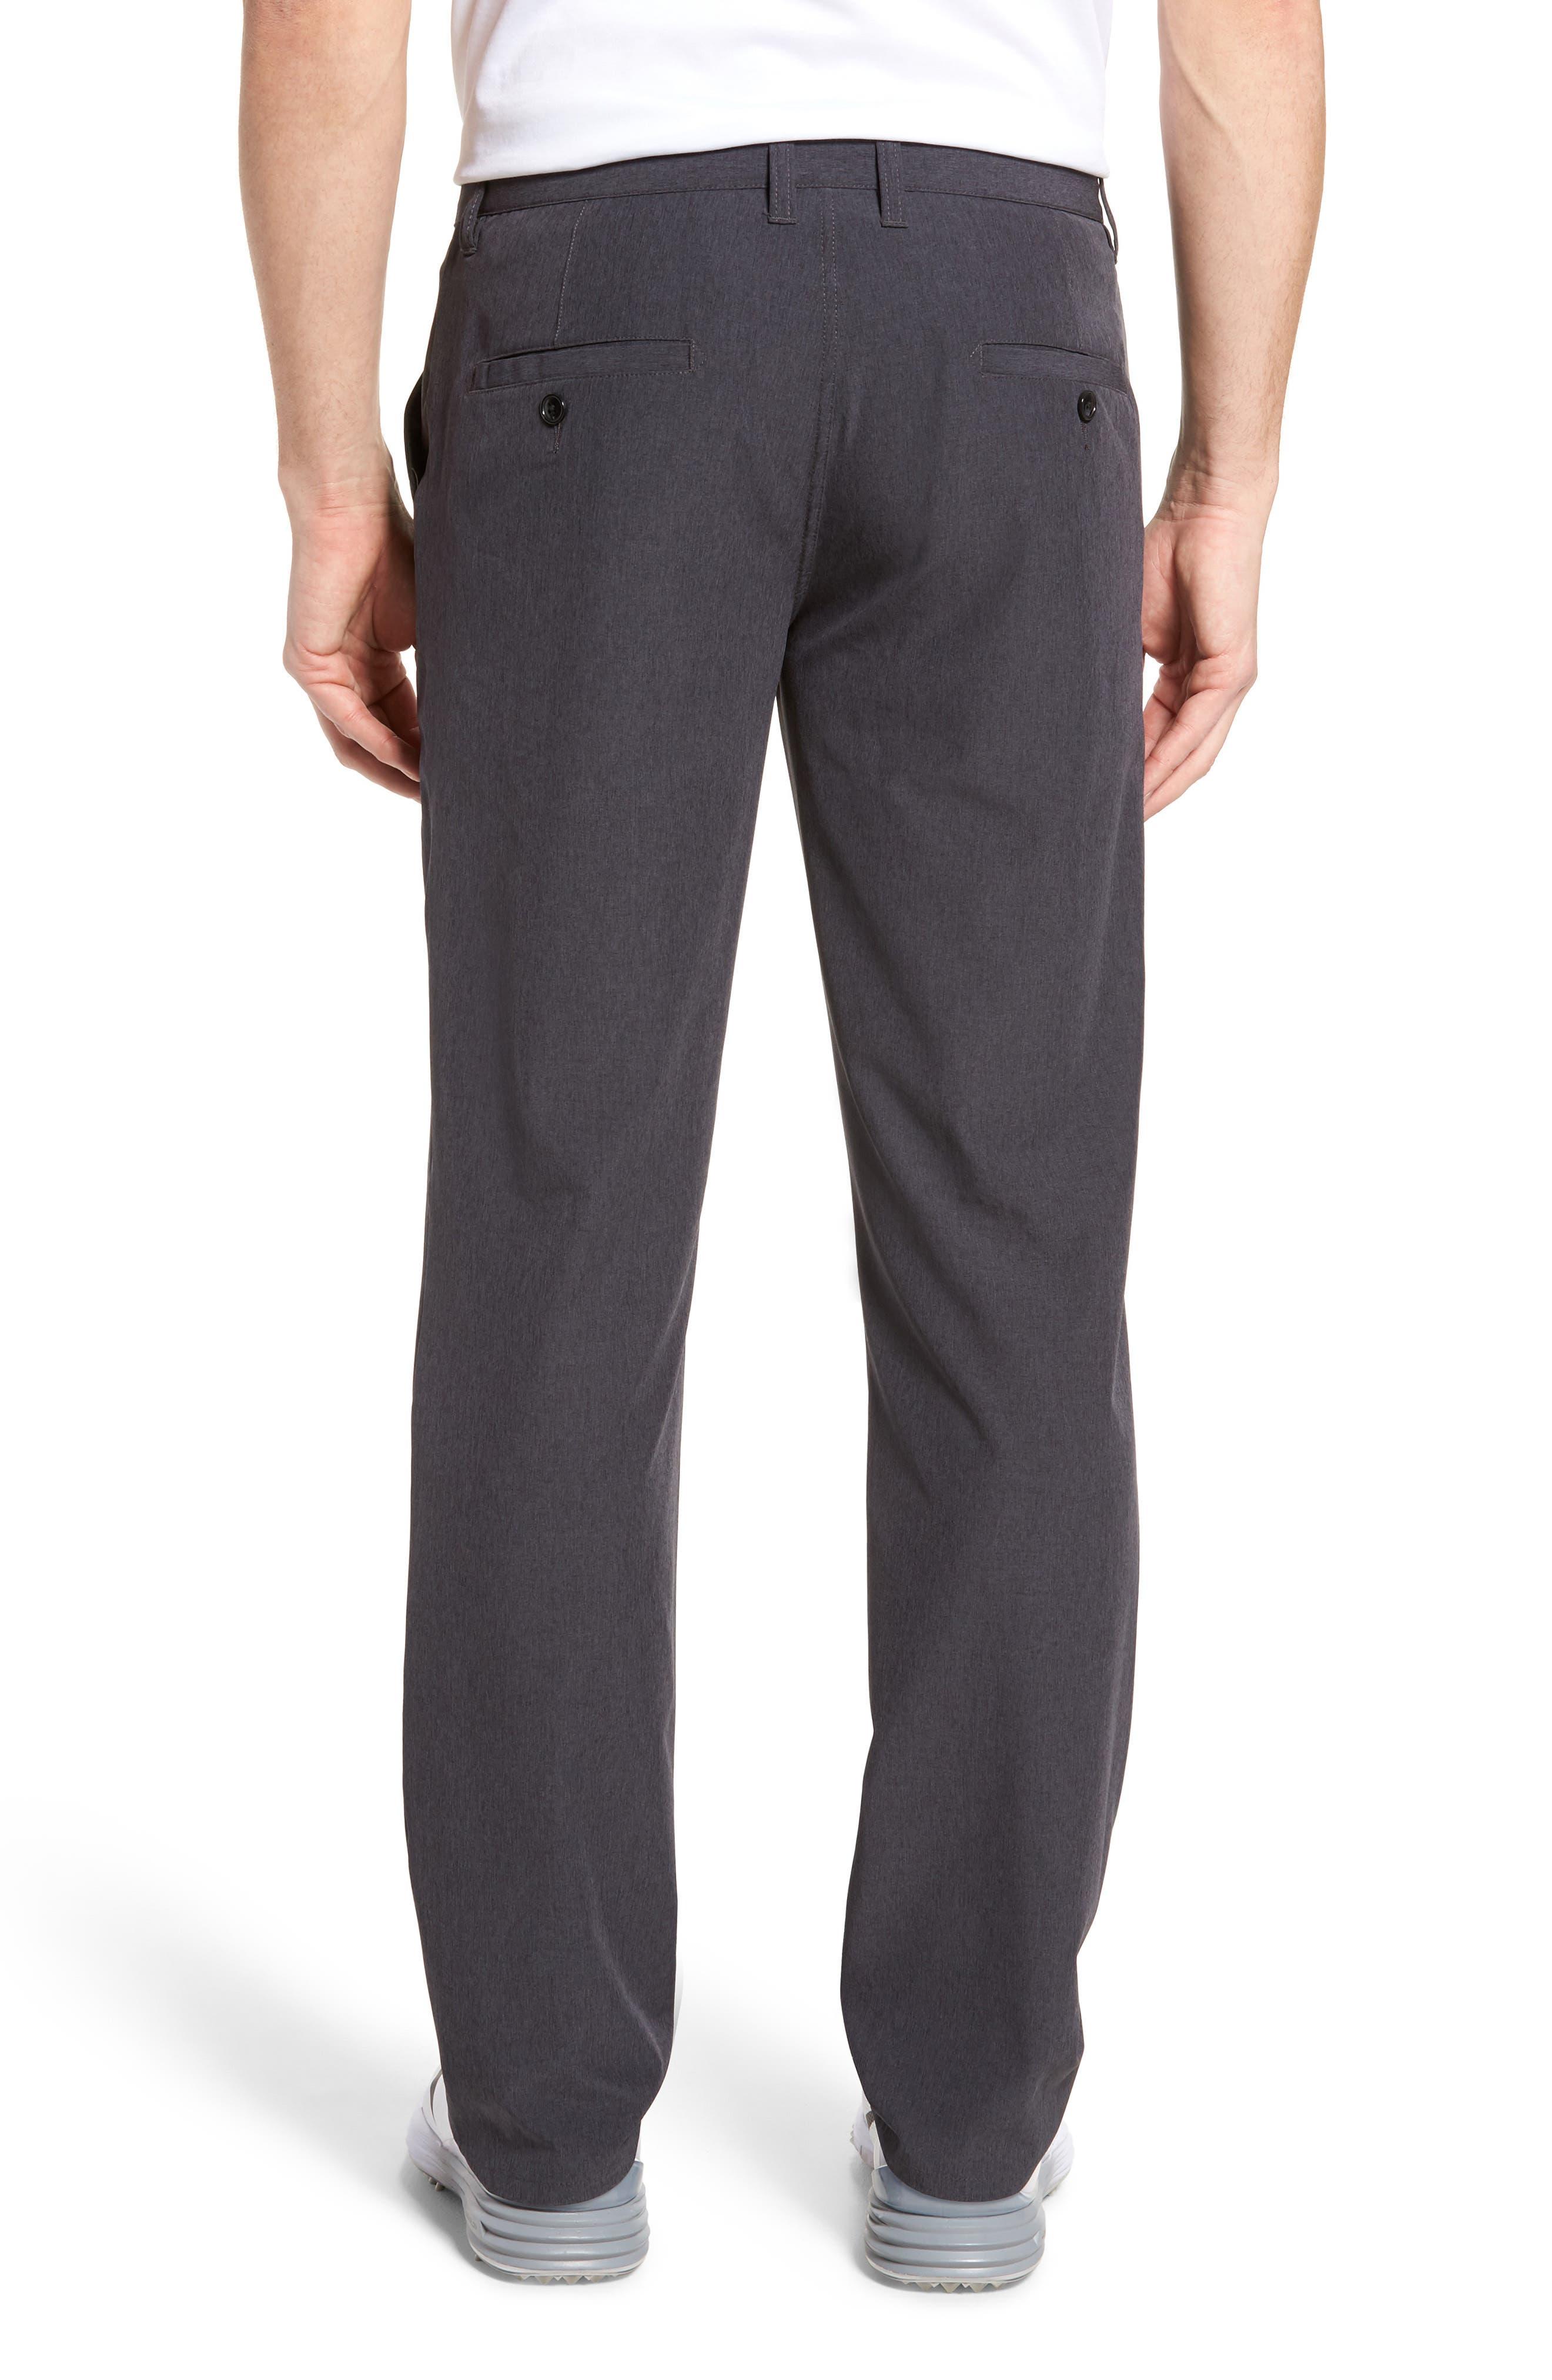 Pantladdium Pants,                             Alternate thumbnail 2, color,                             HEATHER BLACK